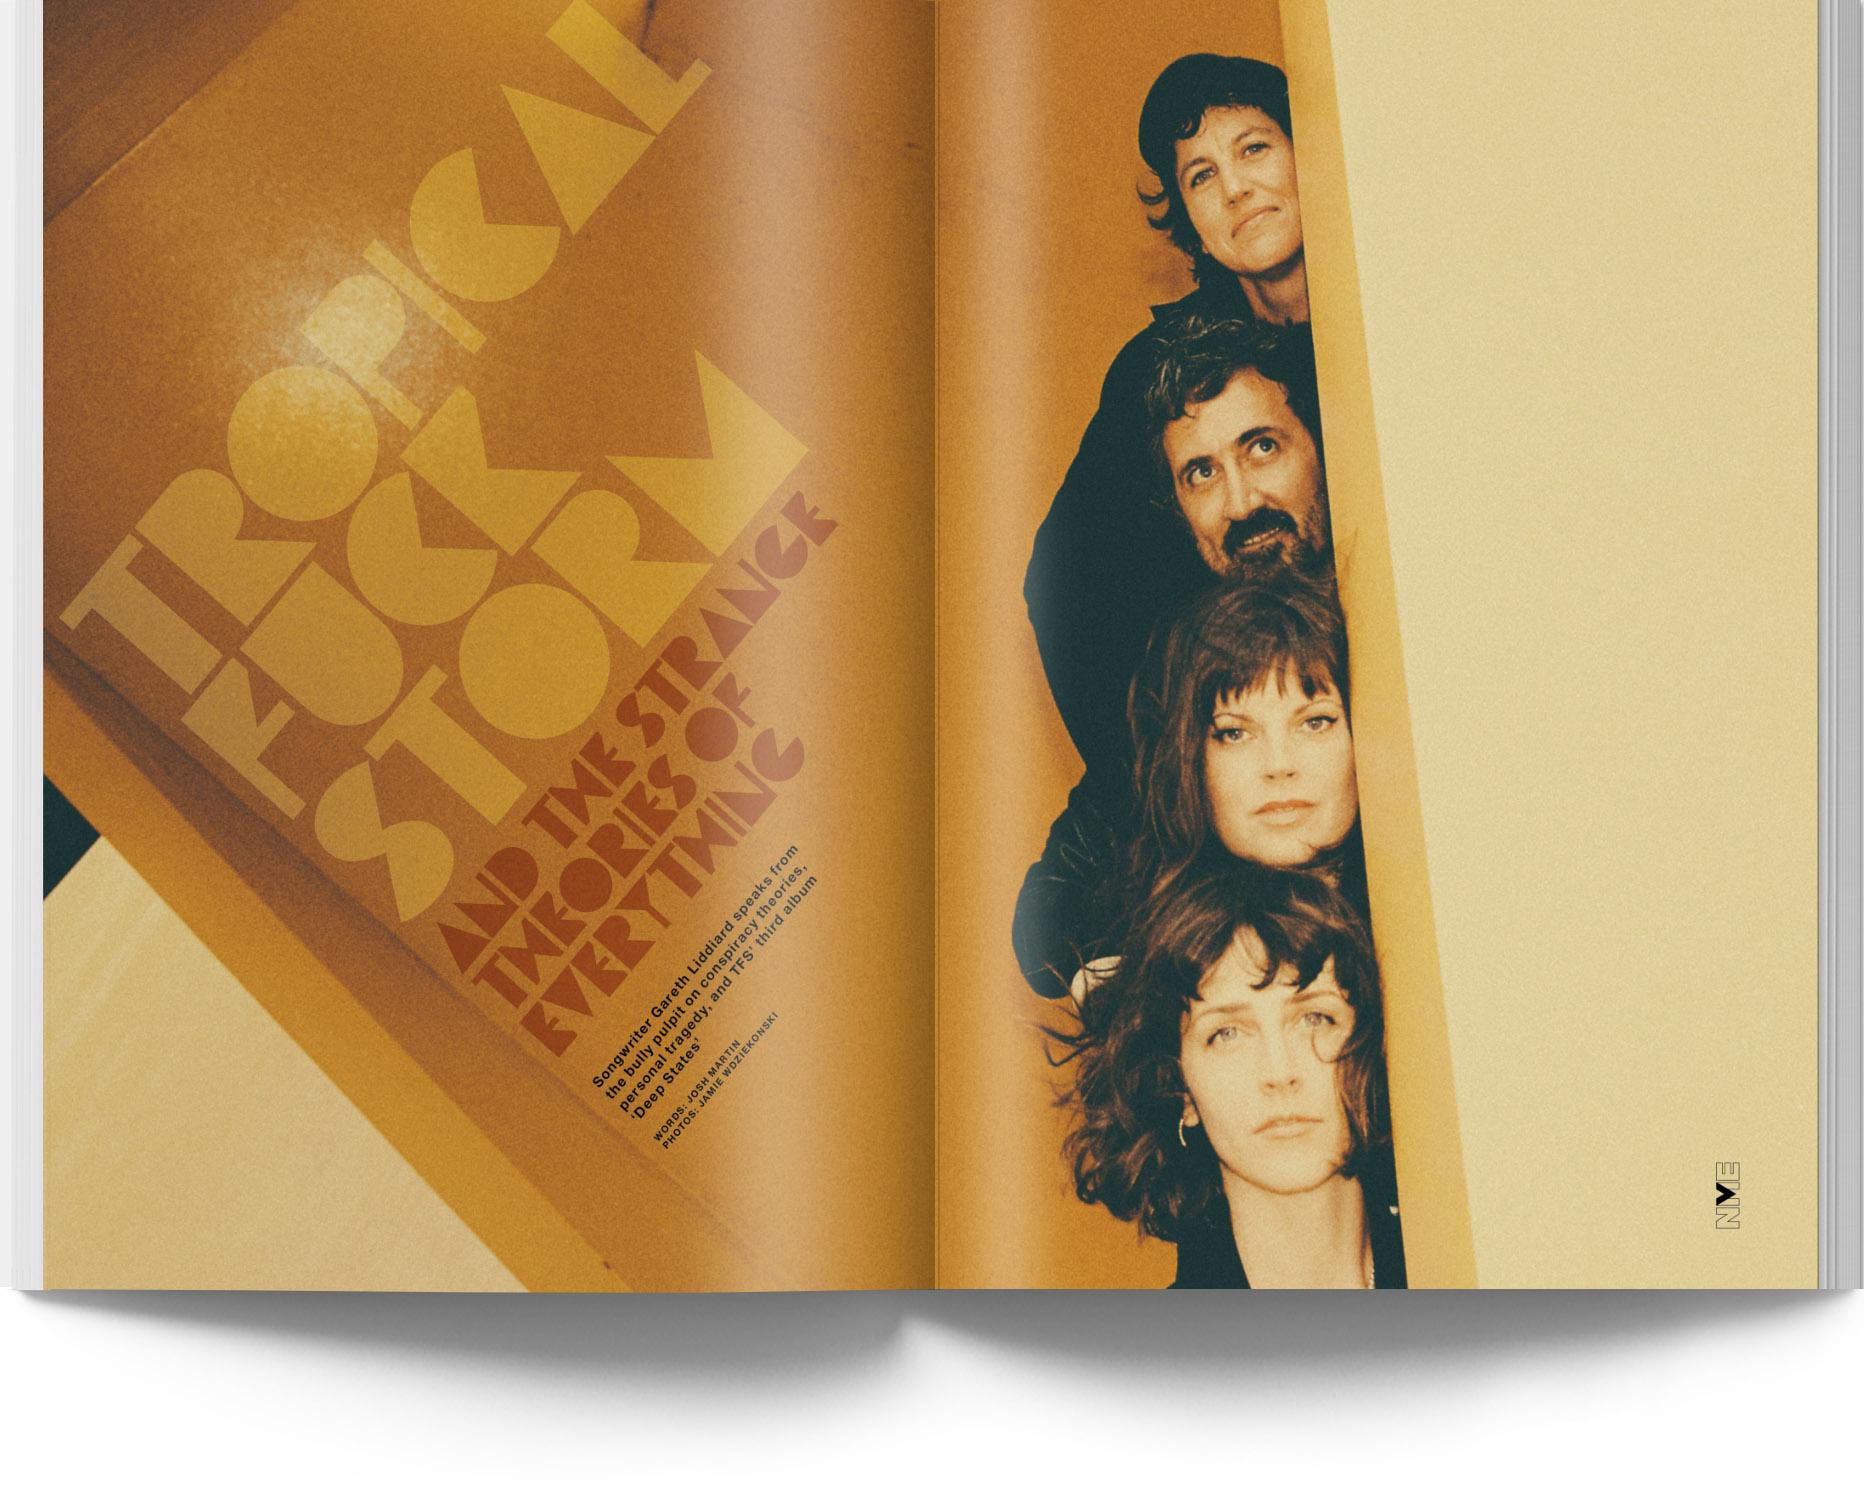 NME Australia Magazine Issue 21